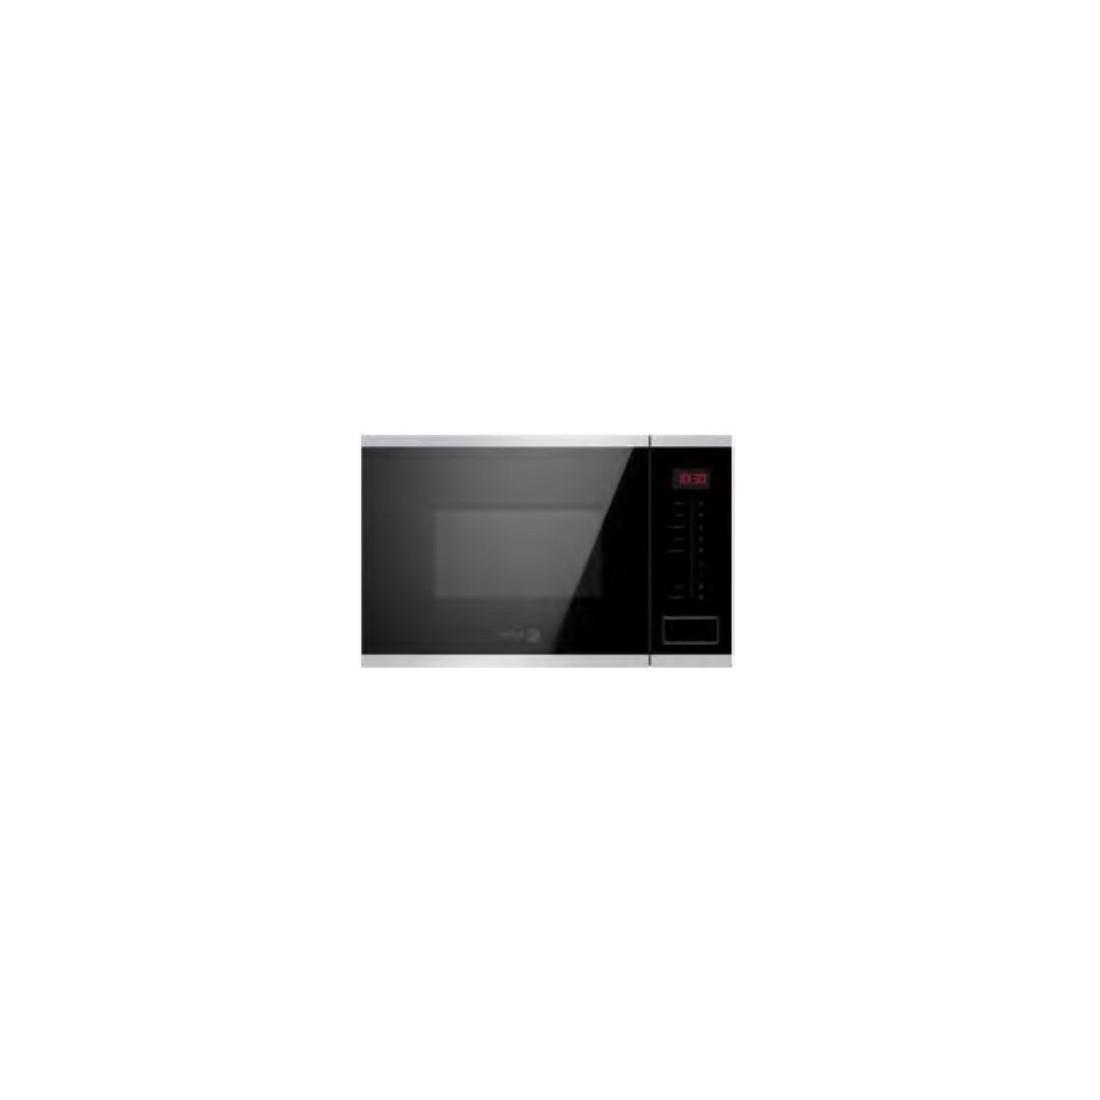 Microondas Integrable - Fagor 3MWB-20BTCGX, Acero Inoxidable